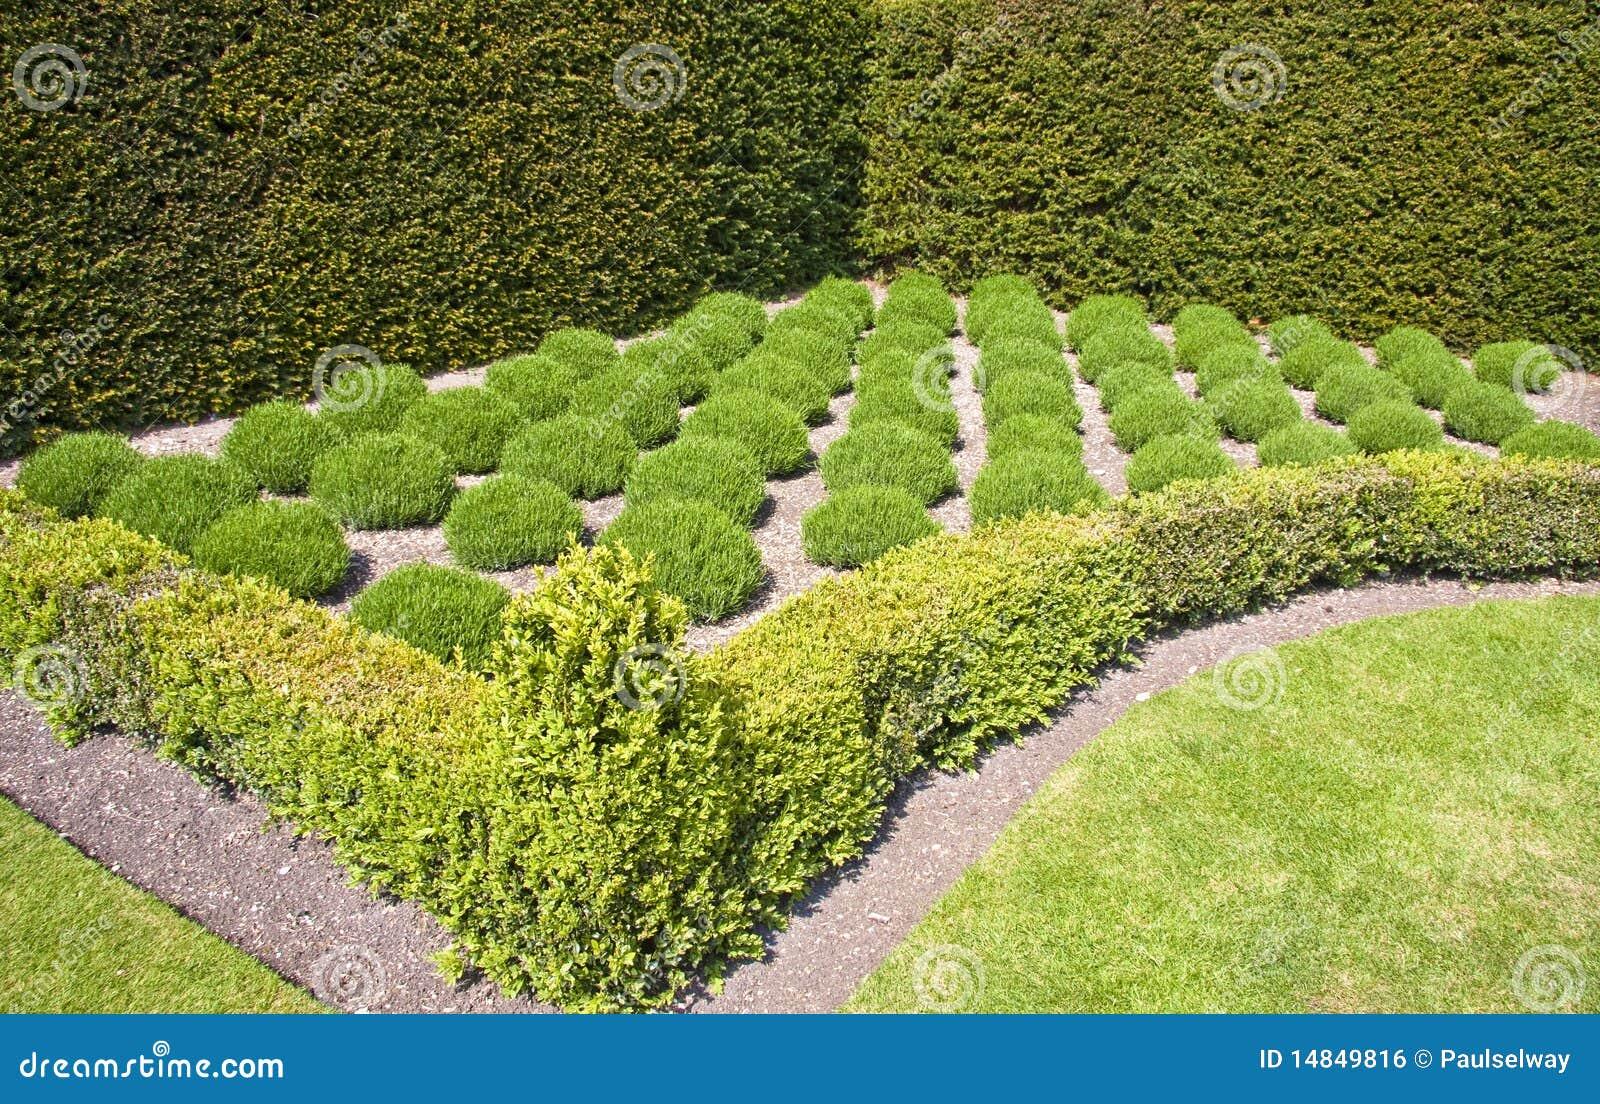 Formal lavender herb garden stock photo image of for Jardines de lavanda